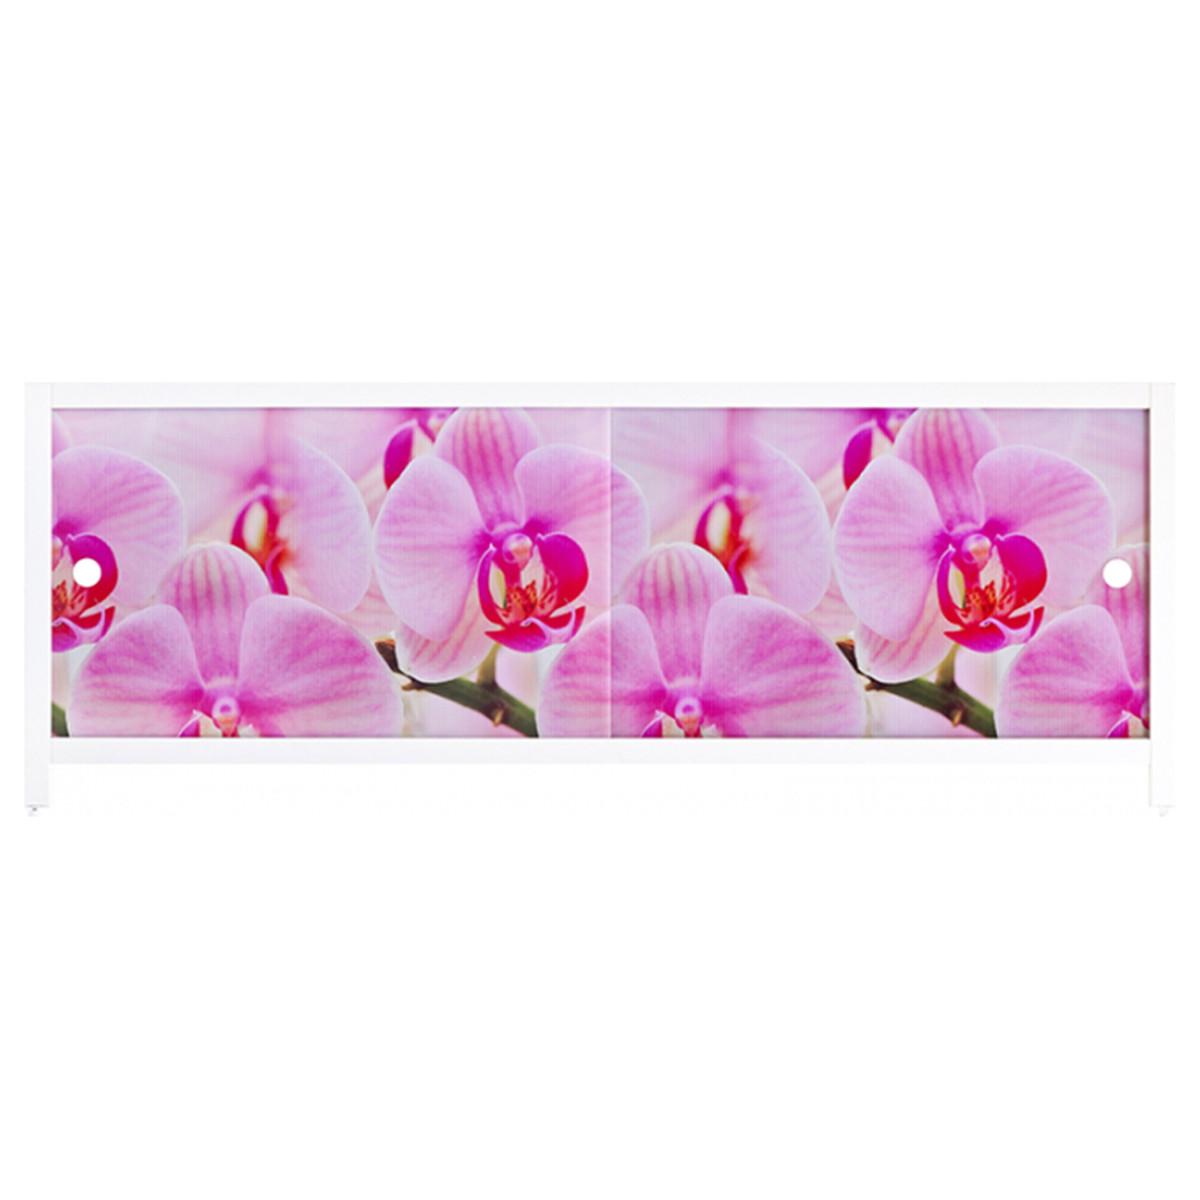 Экран под ванну Метакам Ультра Лёгкий АРТ Дикая орхидея 168м